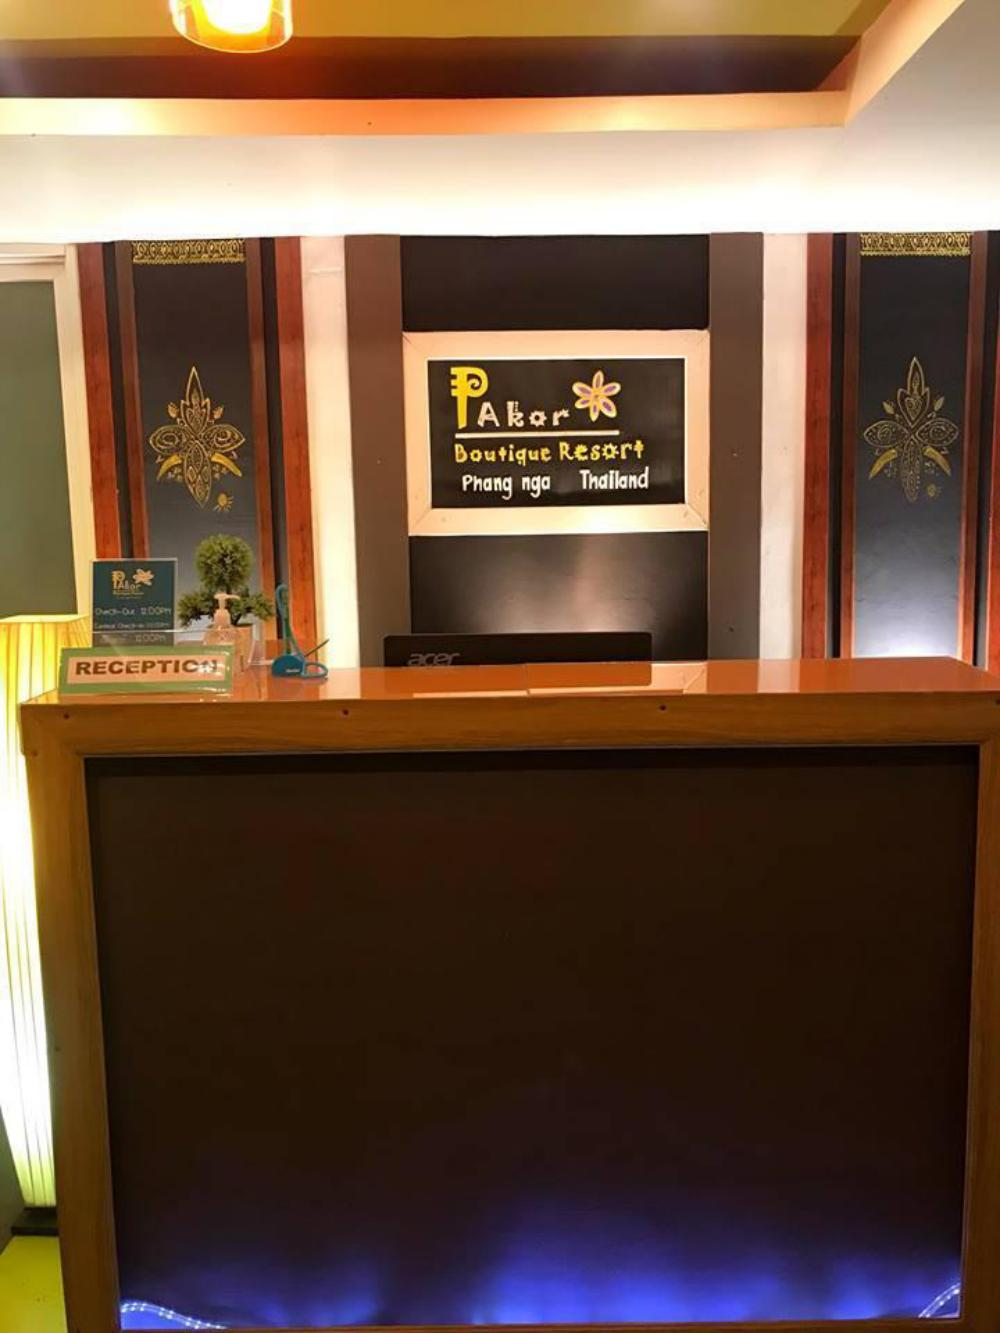 Pakor Boutique Resort